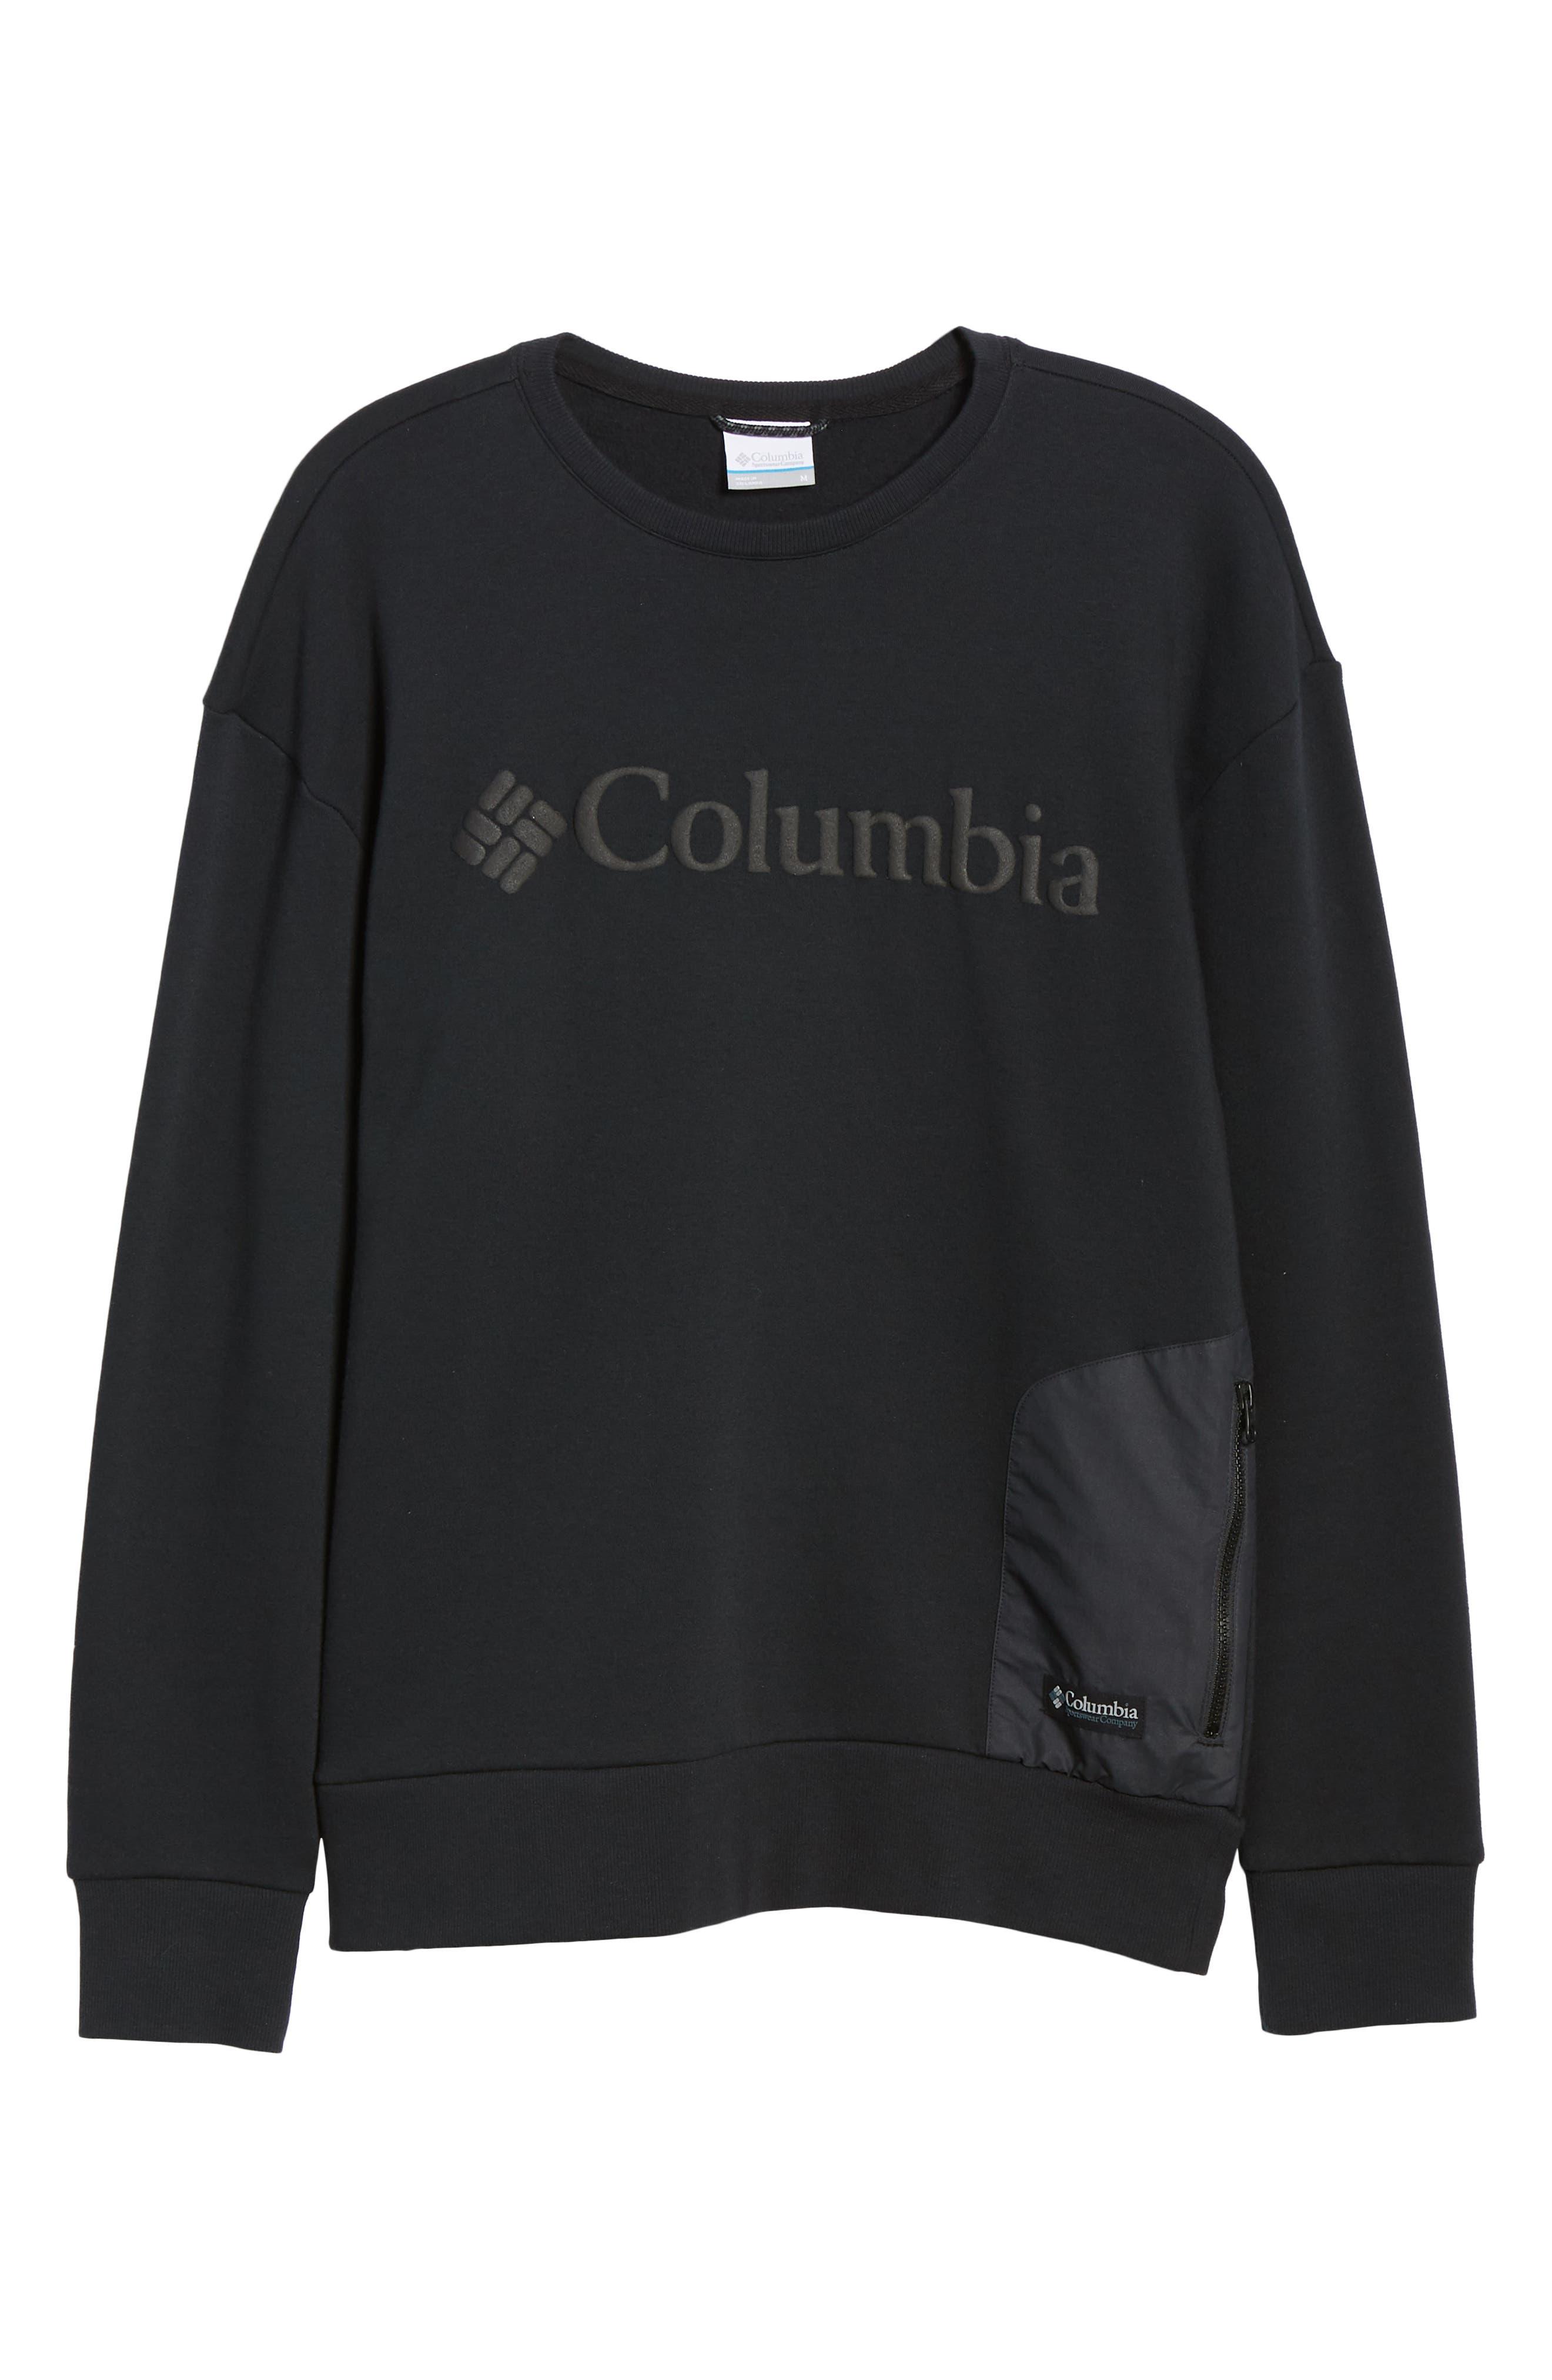 Bugasweat Crewneck Sweatshirt,                             Alternate thumbnail 6, color,                             BLACK